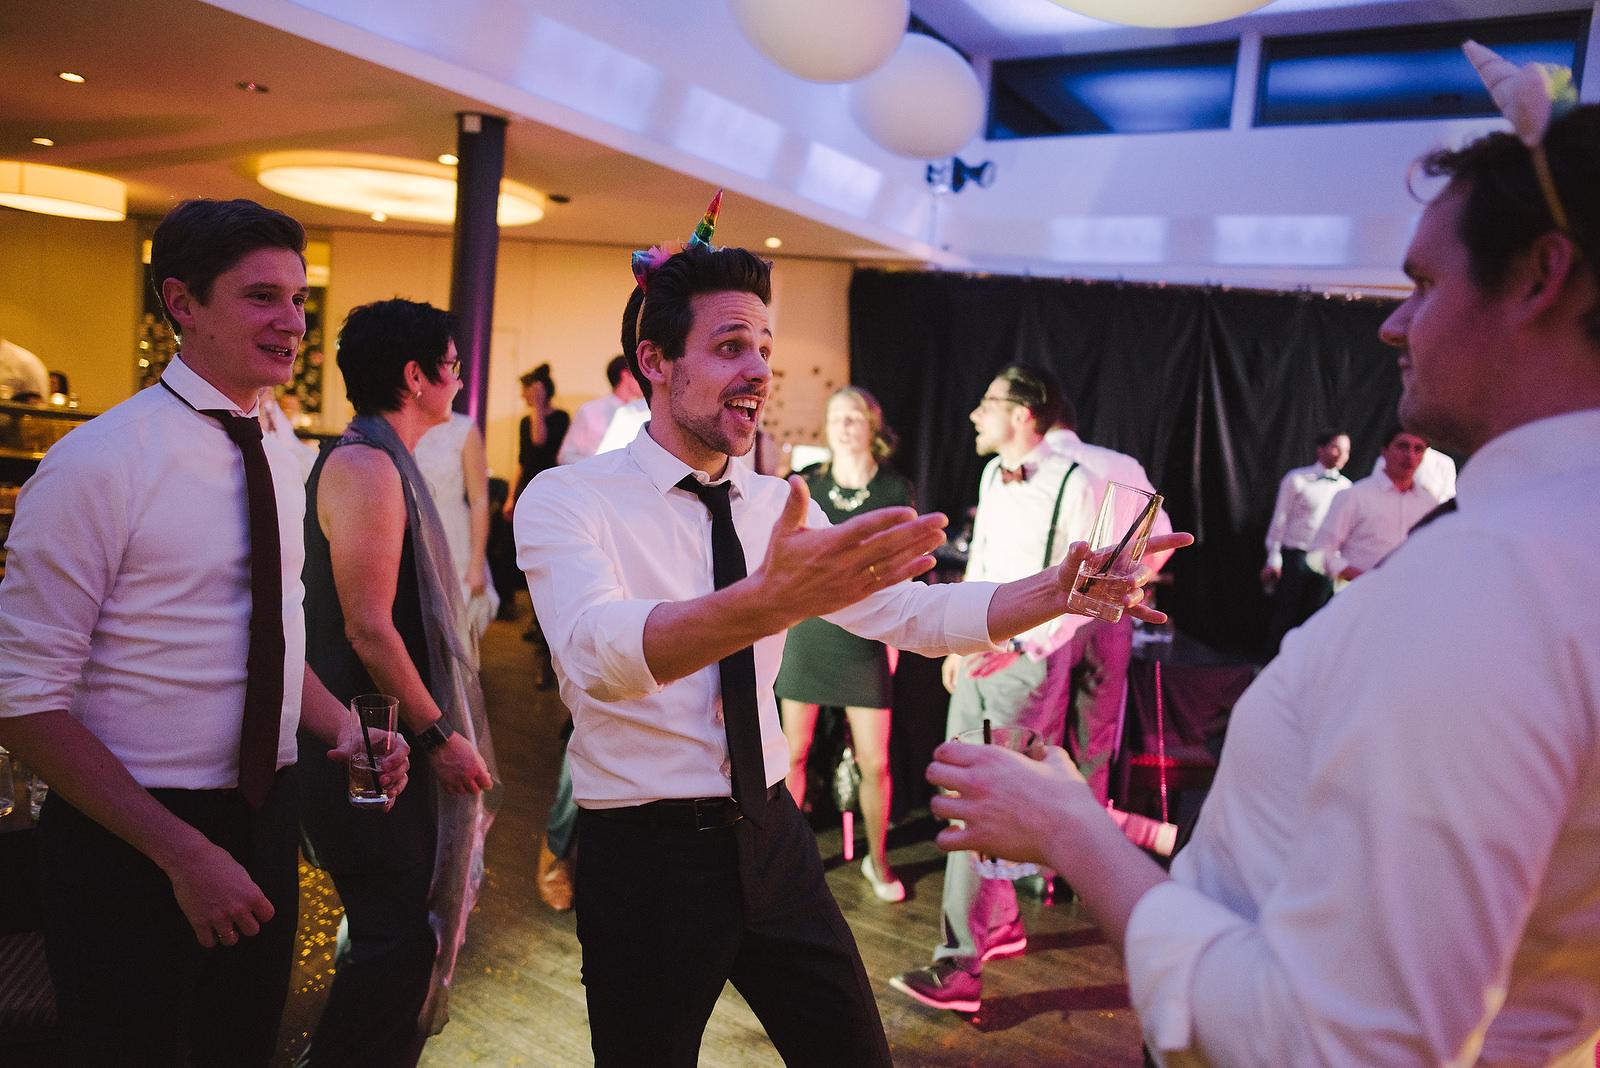 Fotograf Konstanz - Silvester Wedding in Hagnau / Friedrichshafen at Lake of Constance  - 59 -